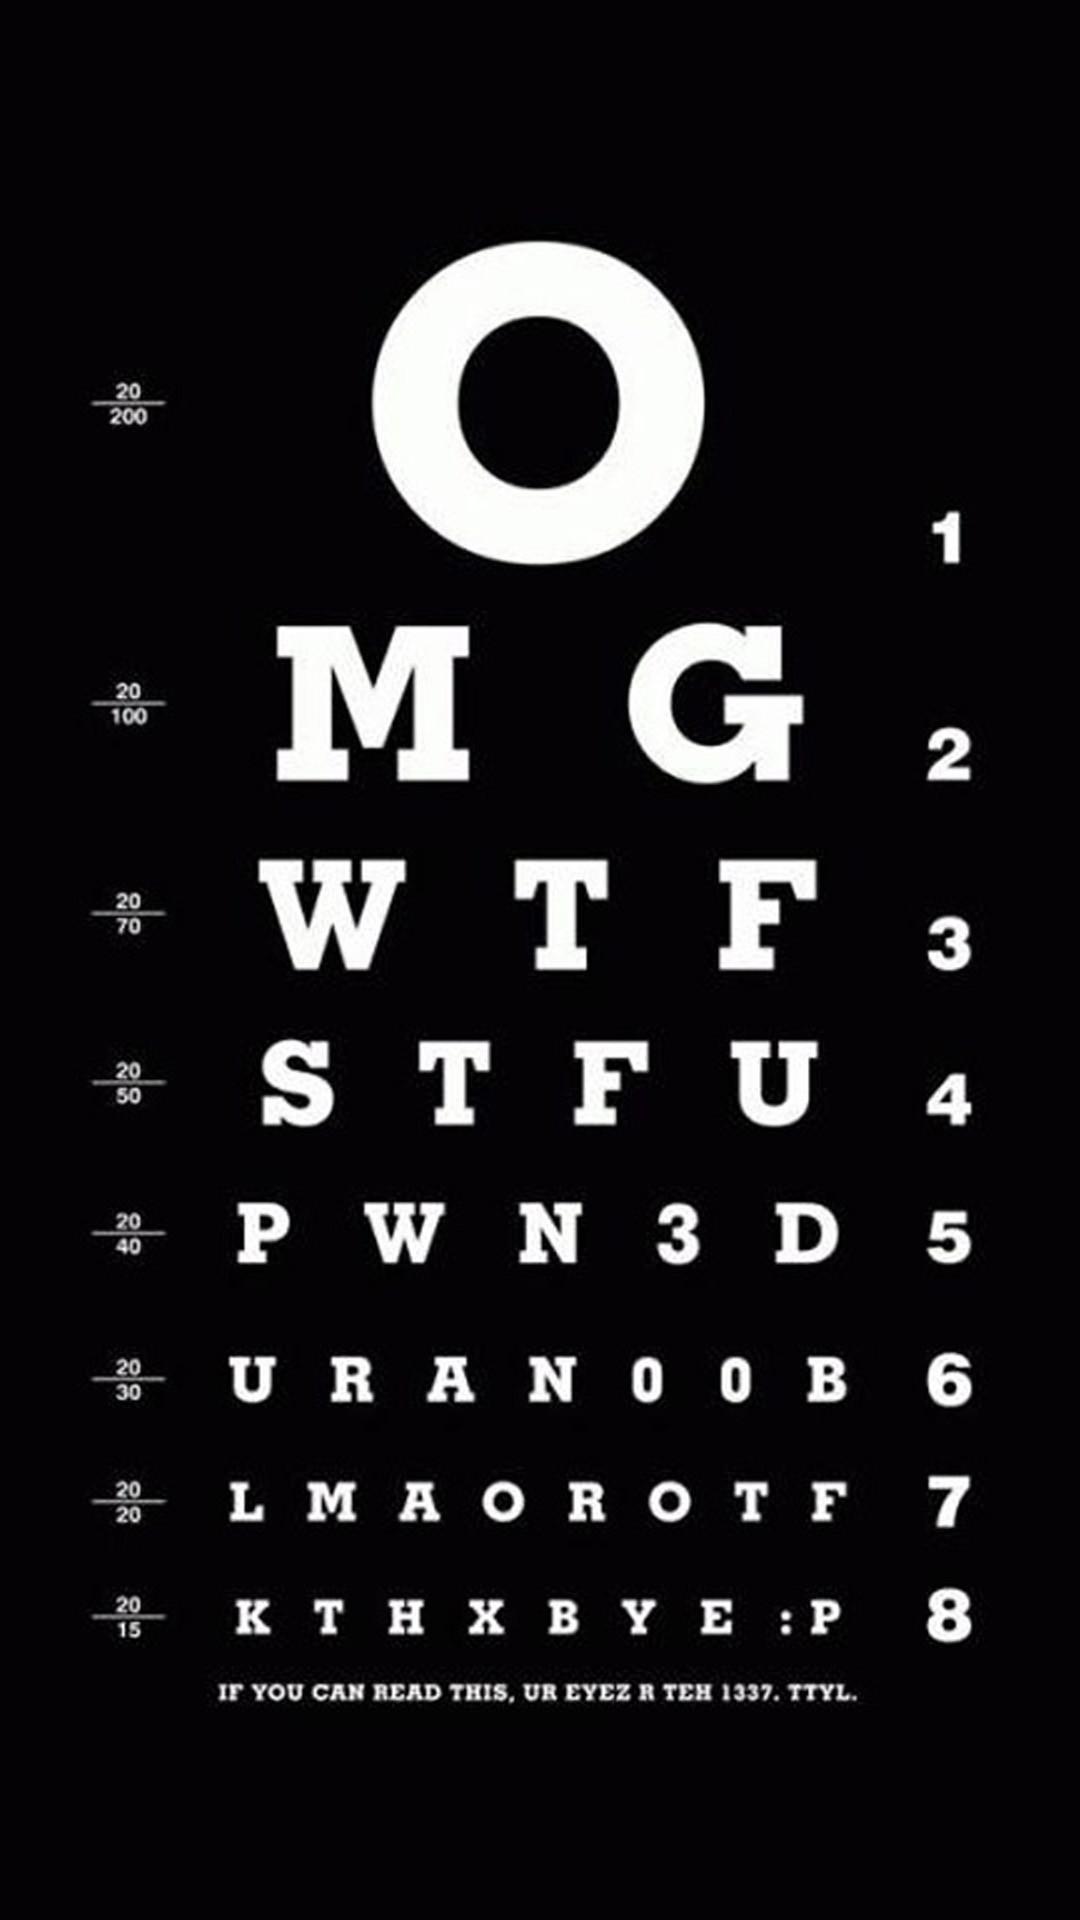 Funny Eye Exam HD Wallpaper iPhone 6 plus